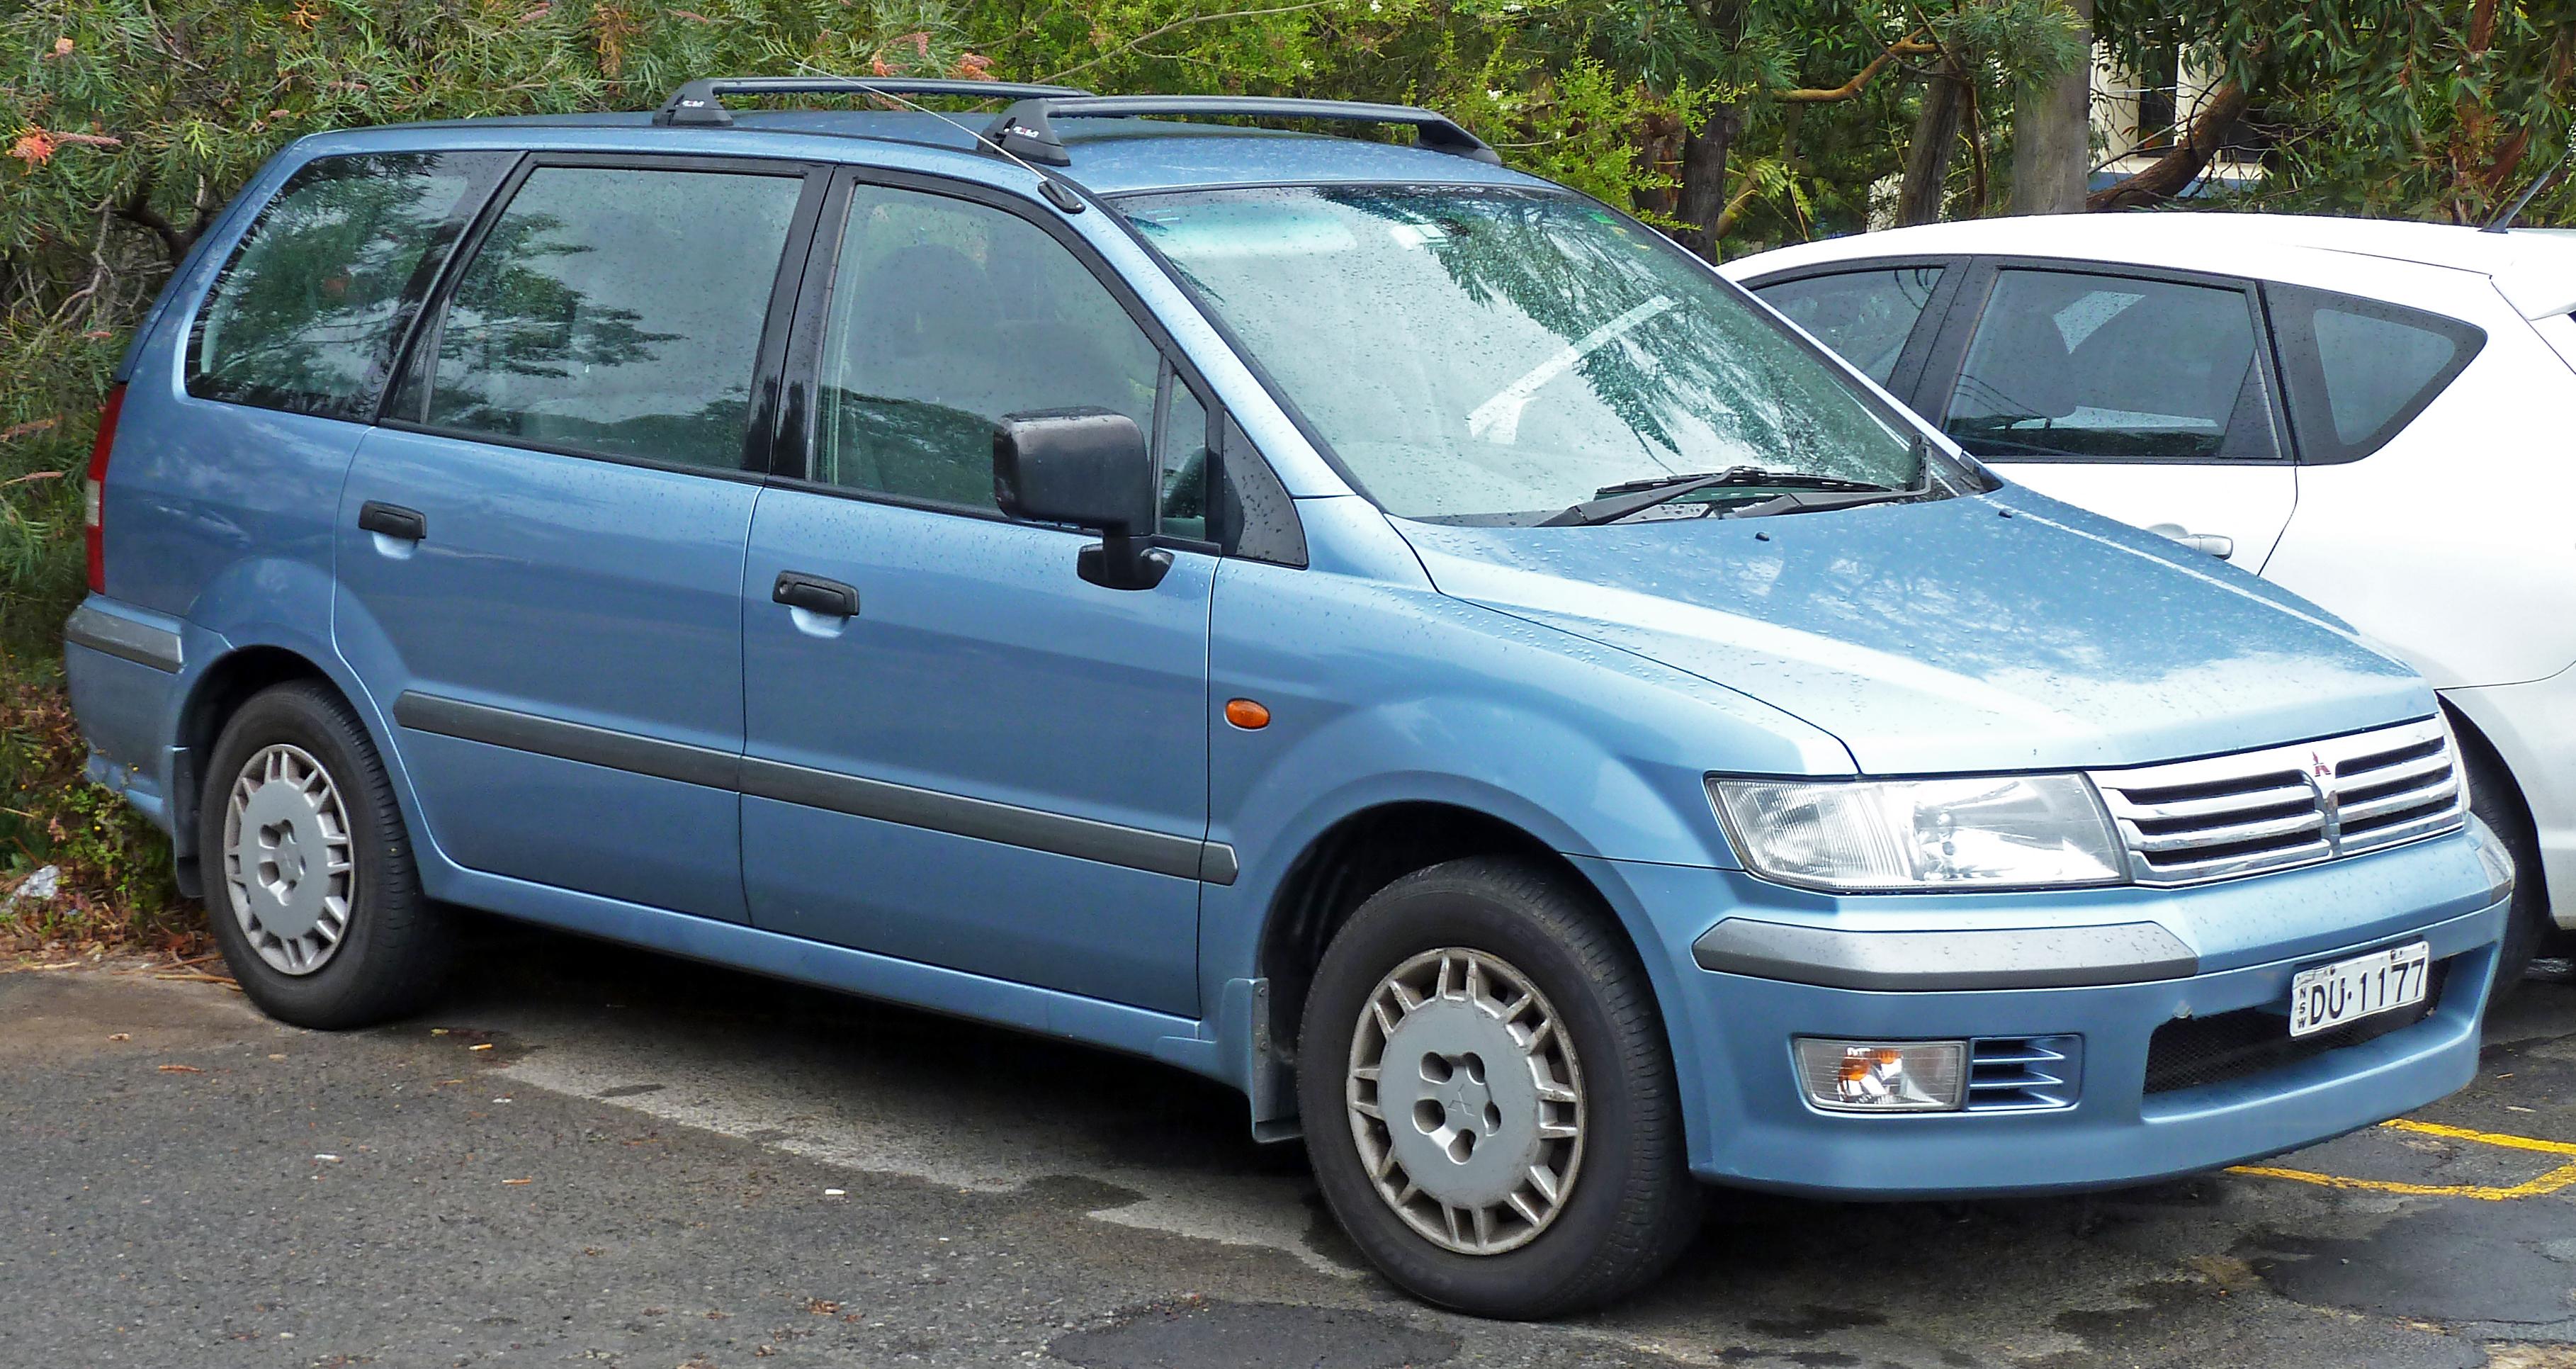 Mitsubishi Chariot I 1983 - 1991 Compact MPV #2